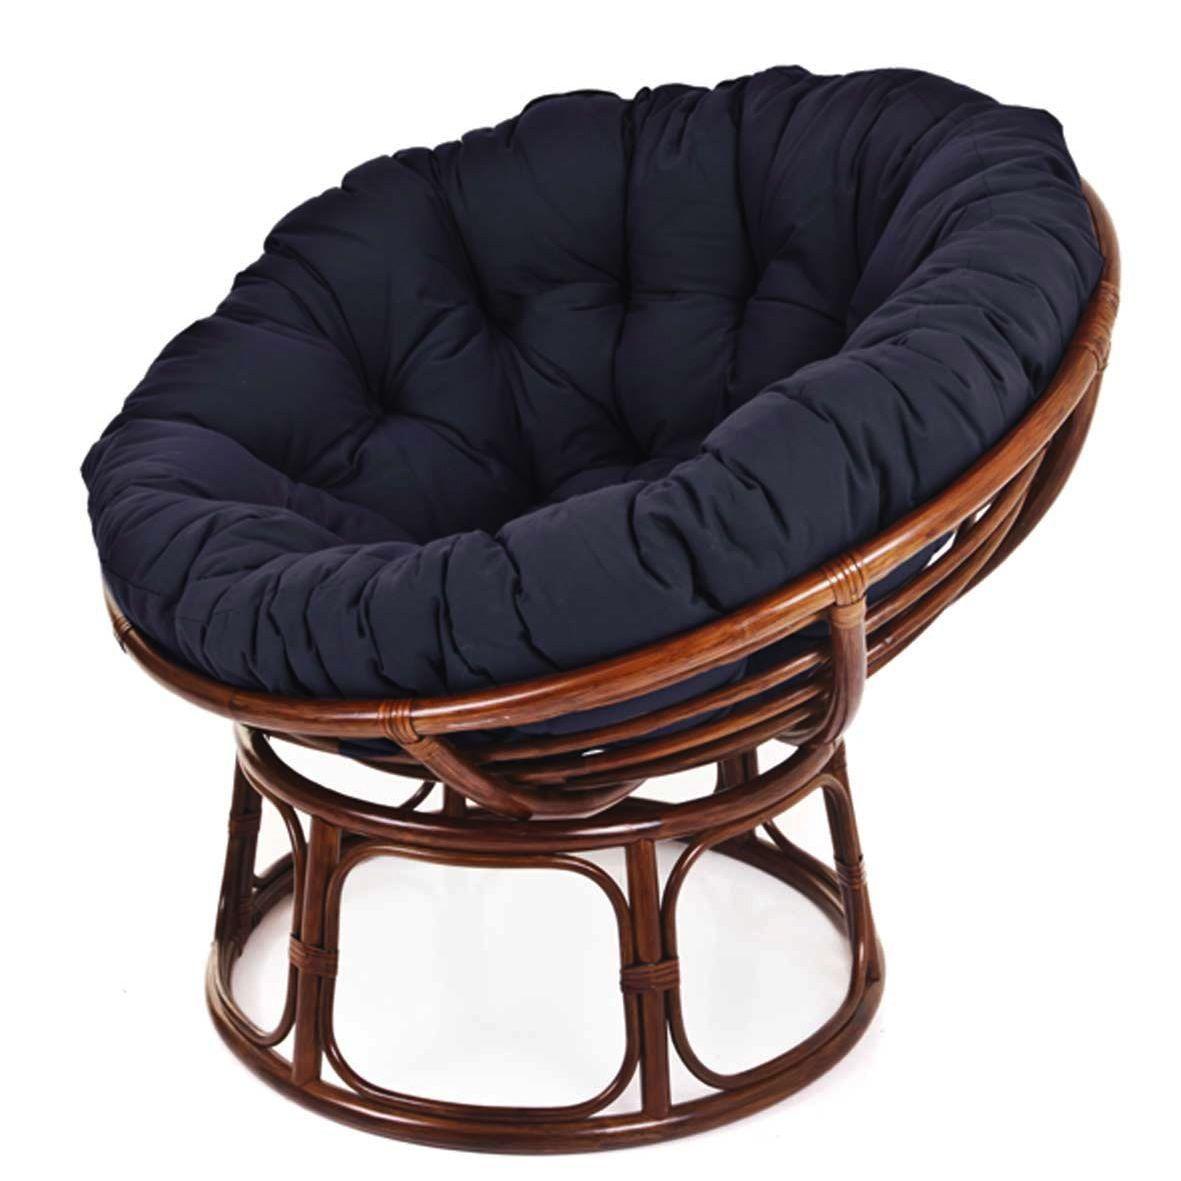 Gorgeus Papasan Chair #1774   Design   Pinterest   Papasan ...